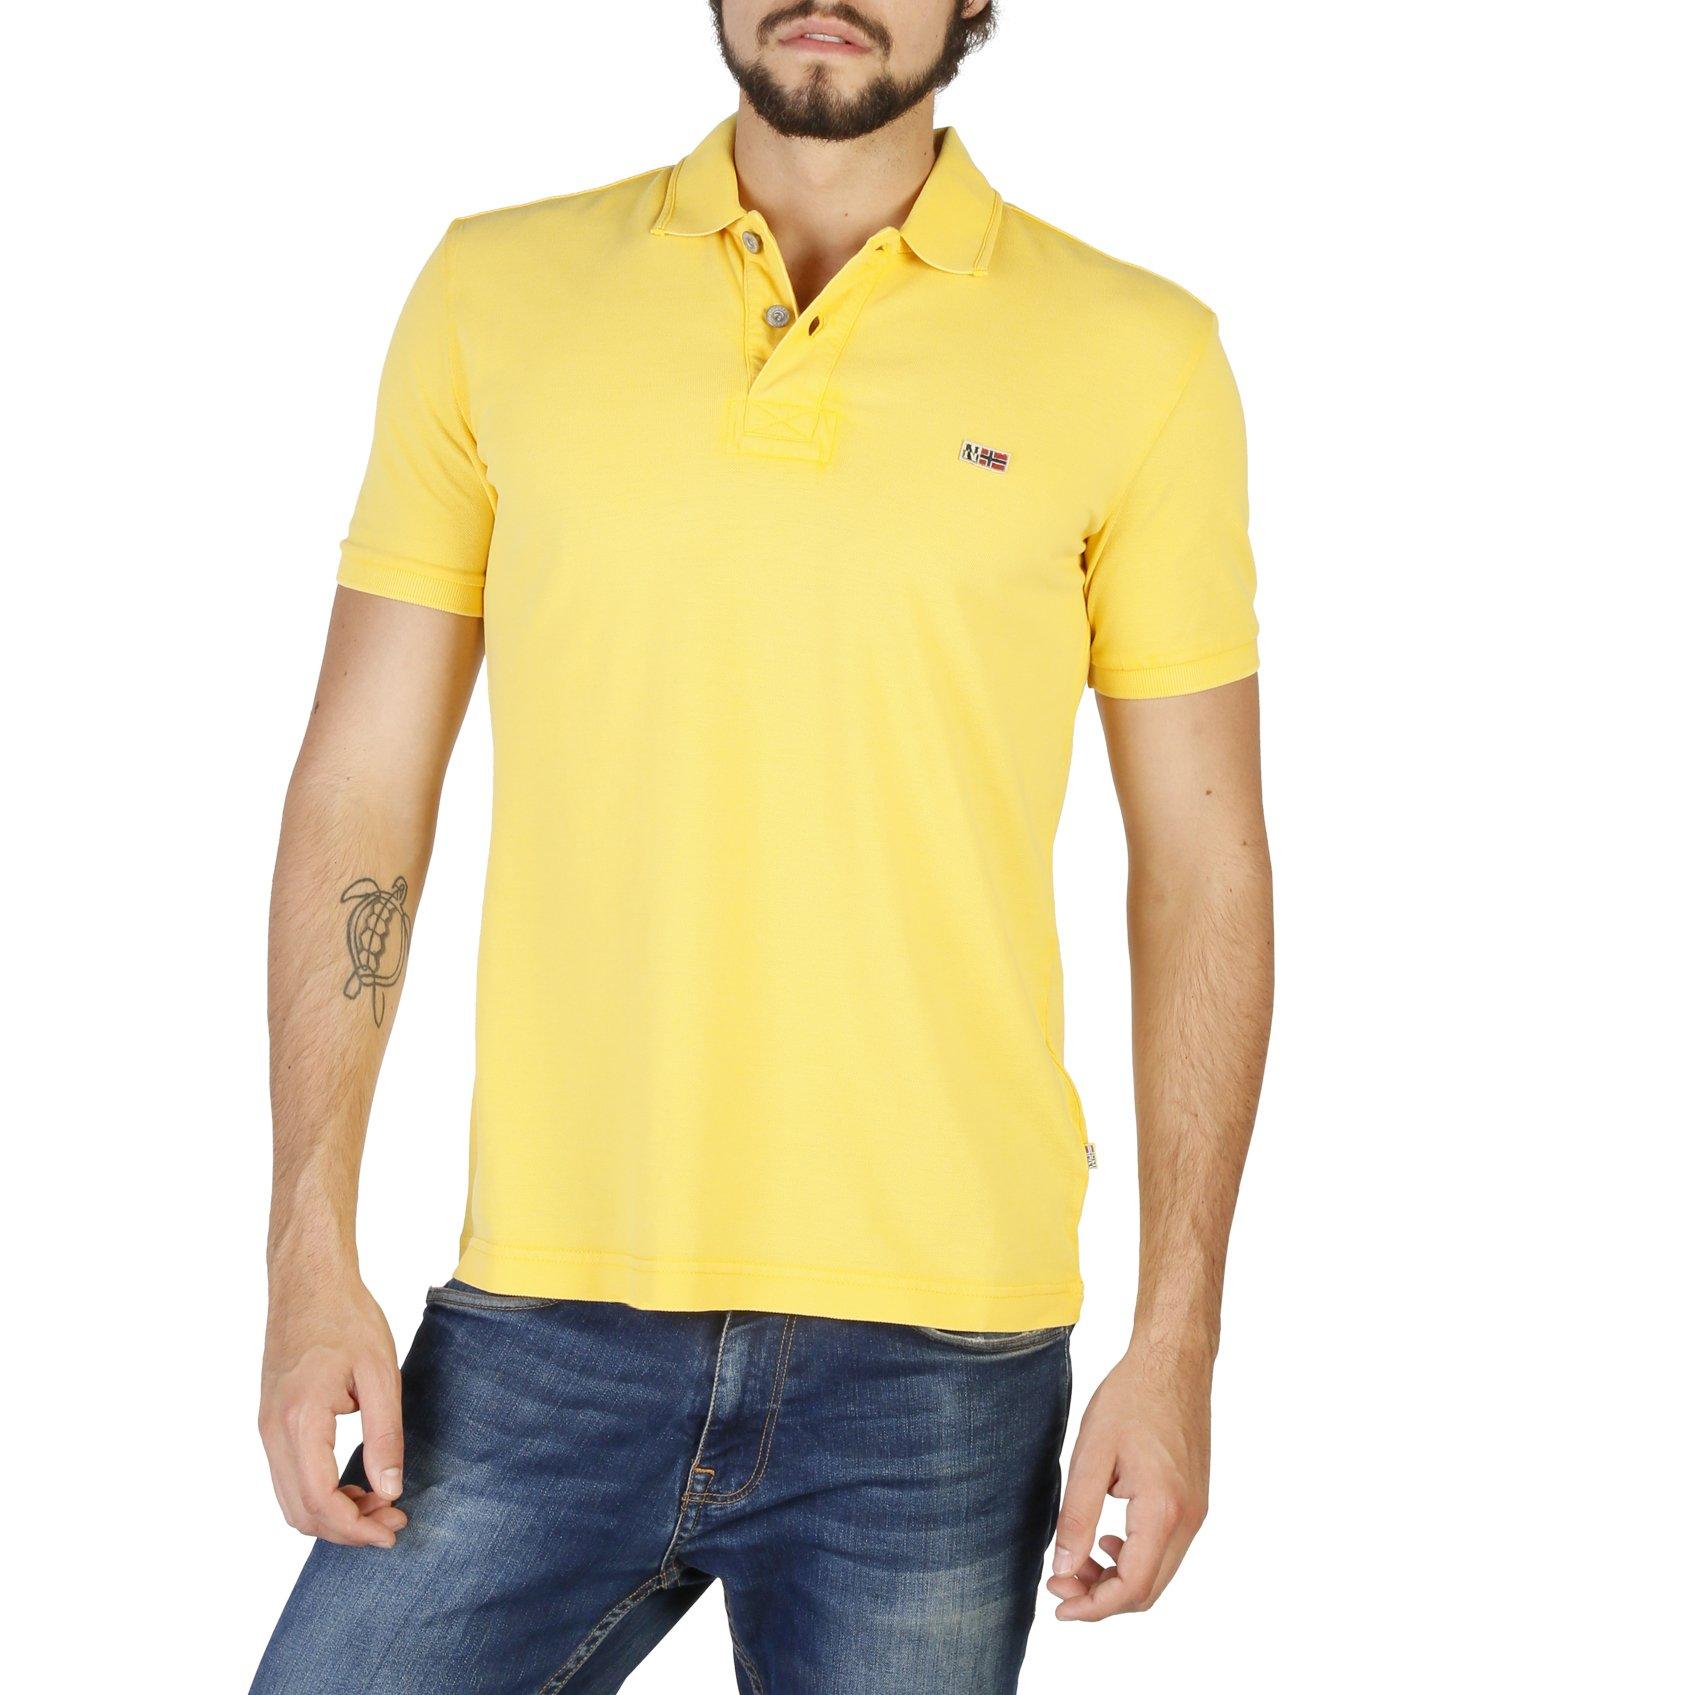 Napapijri Men's Polo Shirt Various Colours N0YHDX - yellow S